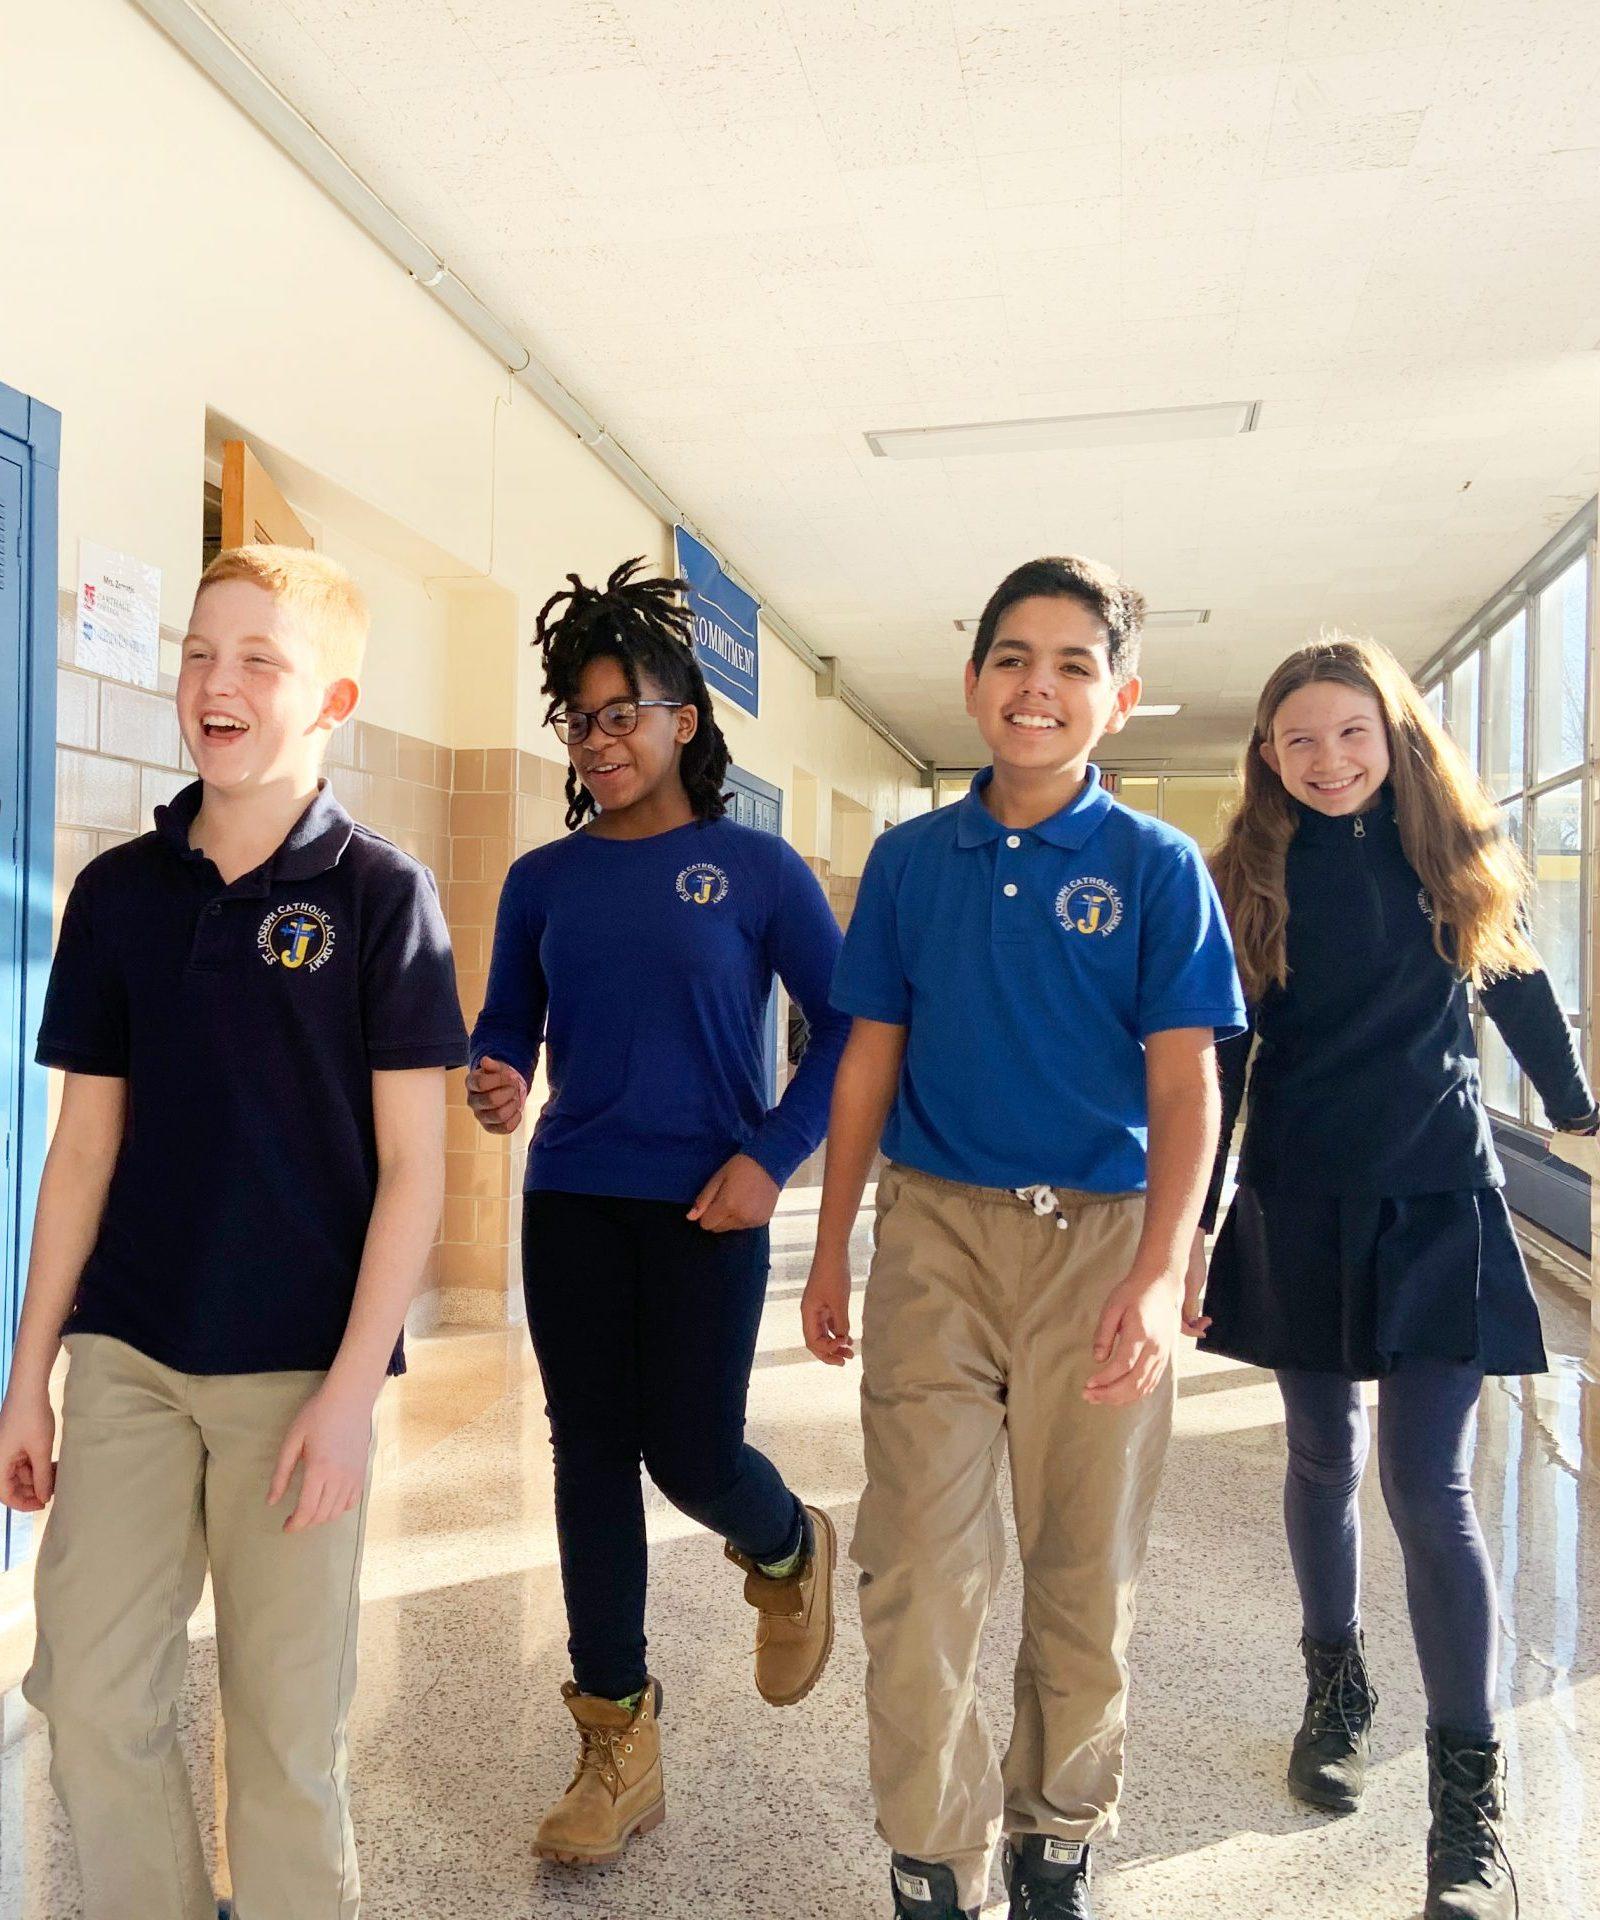 Middle School Kids In Hallway 1 21 21